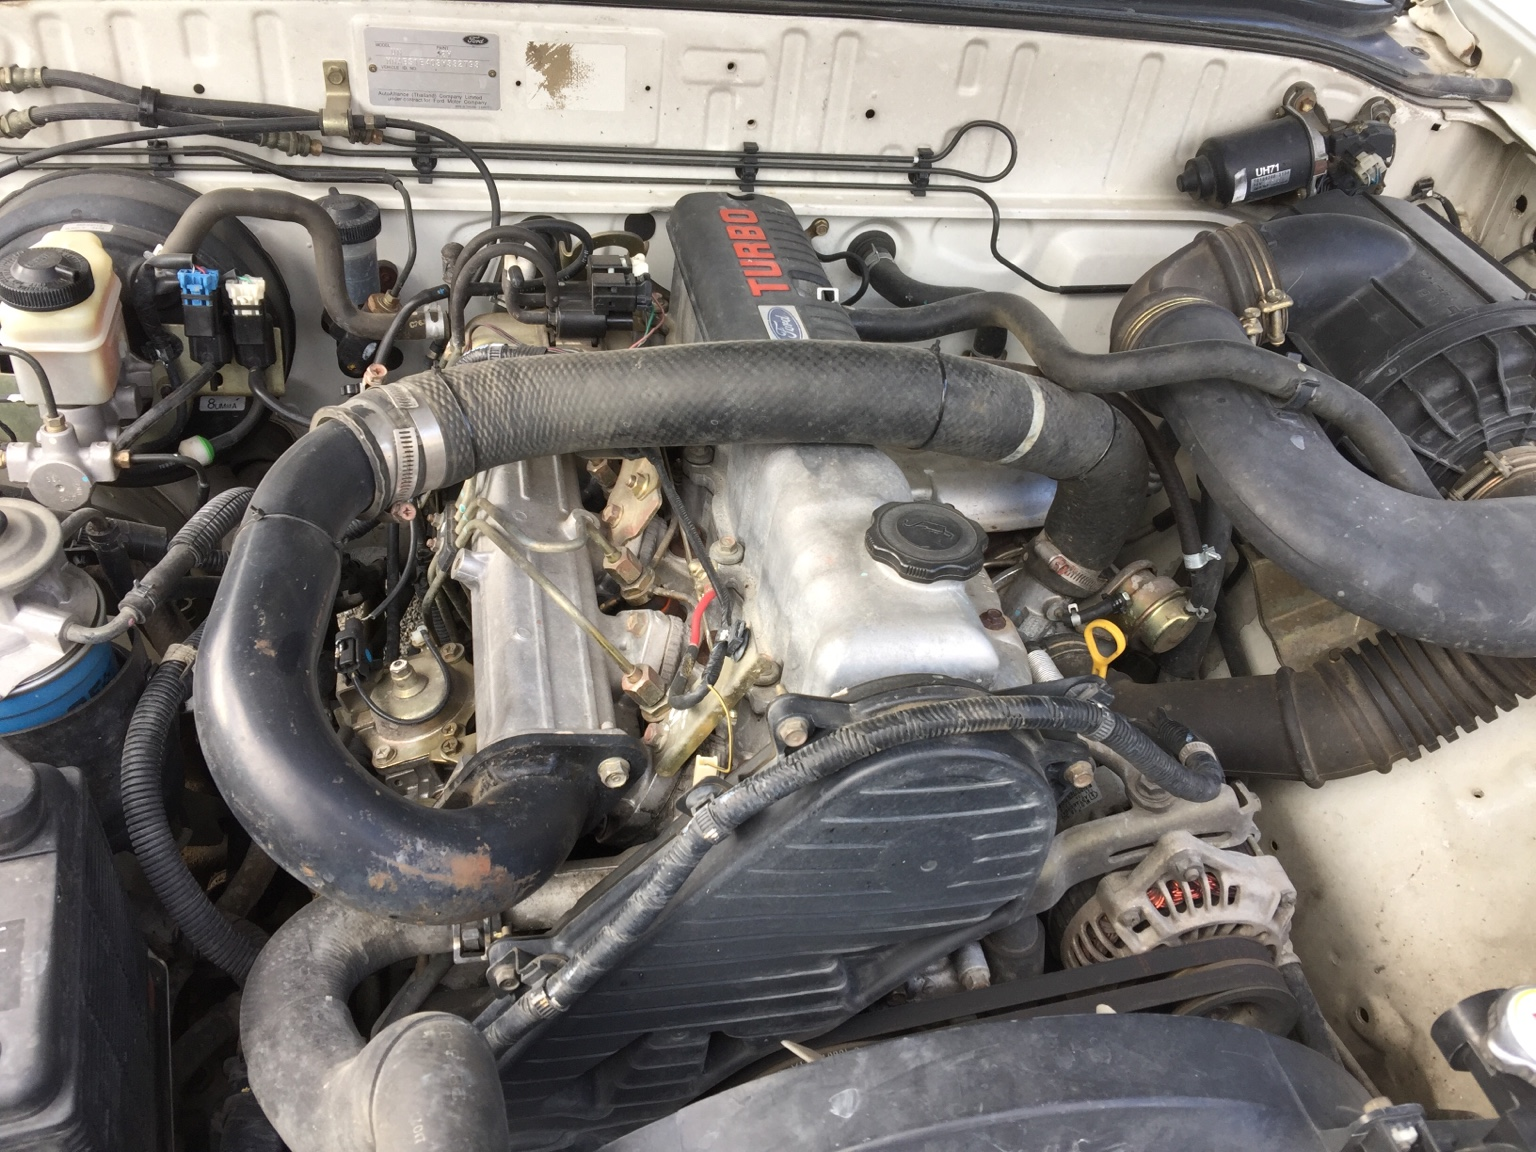 A B D E Feeab F B D on Torque For 2001 Ford 3 8 Intake Manifold